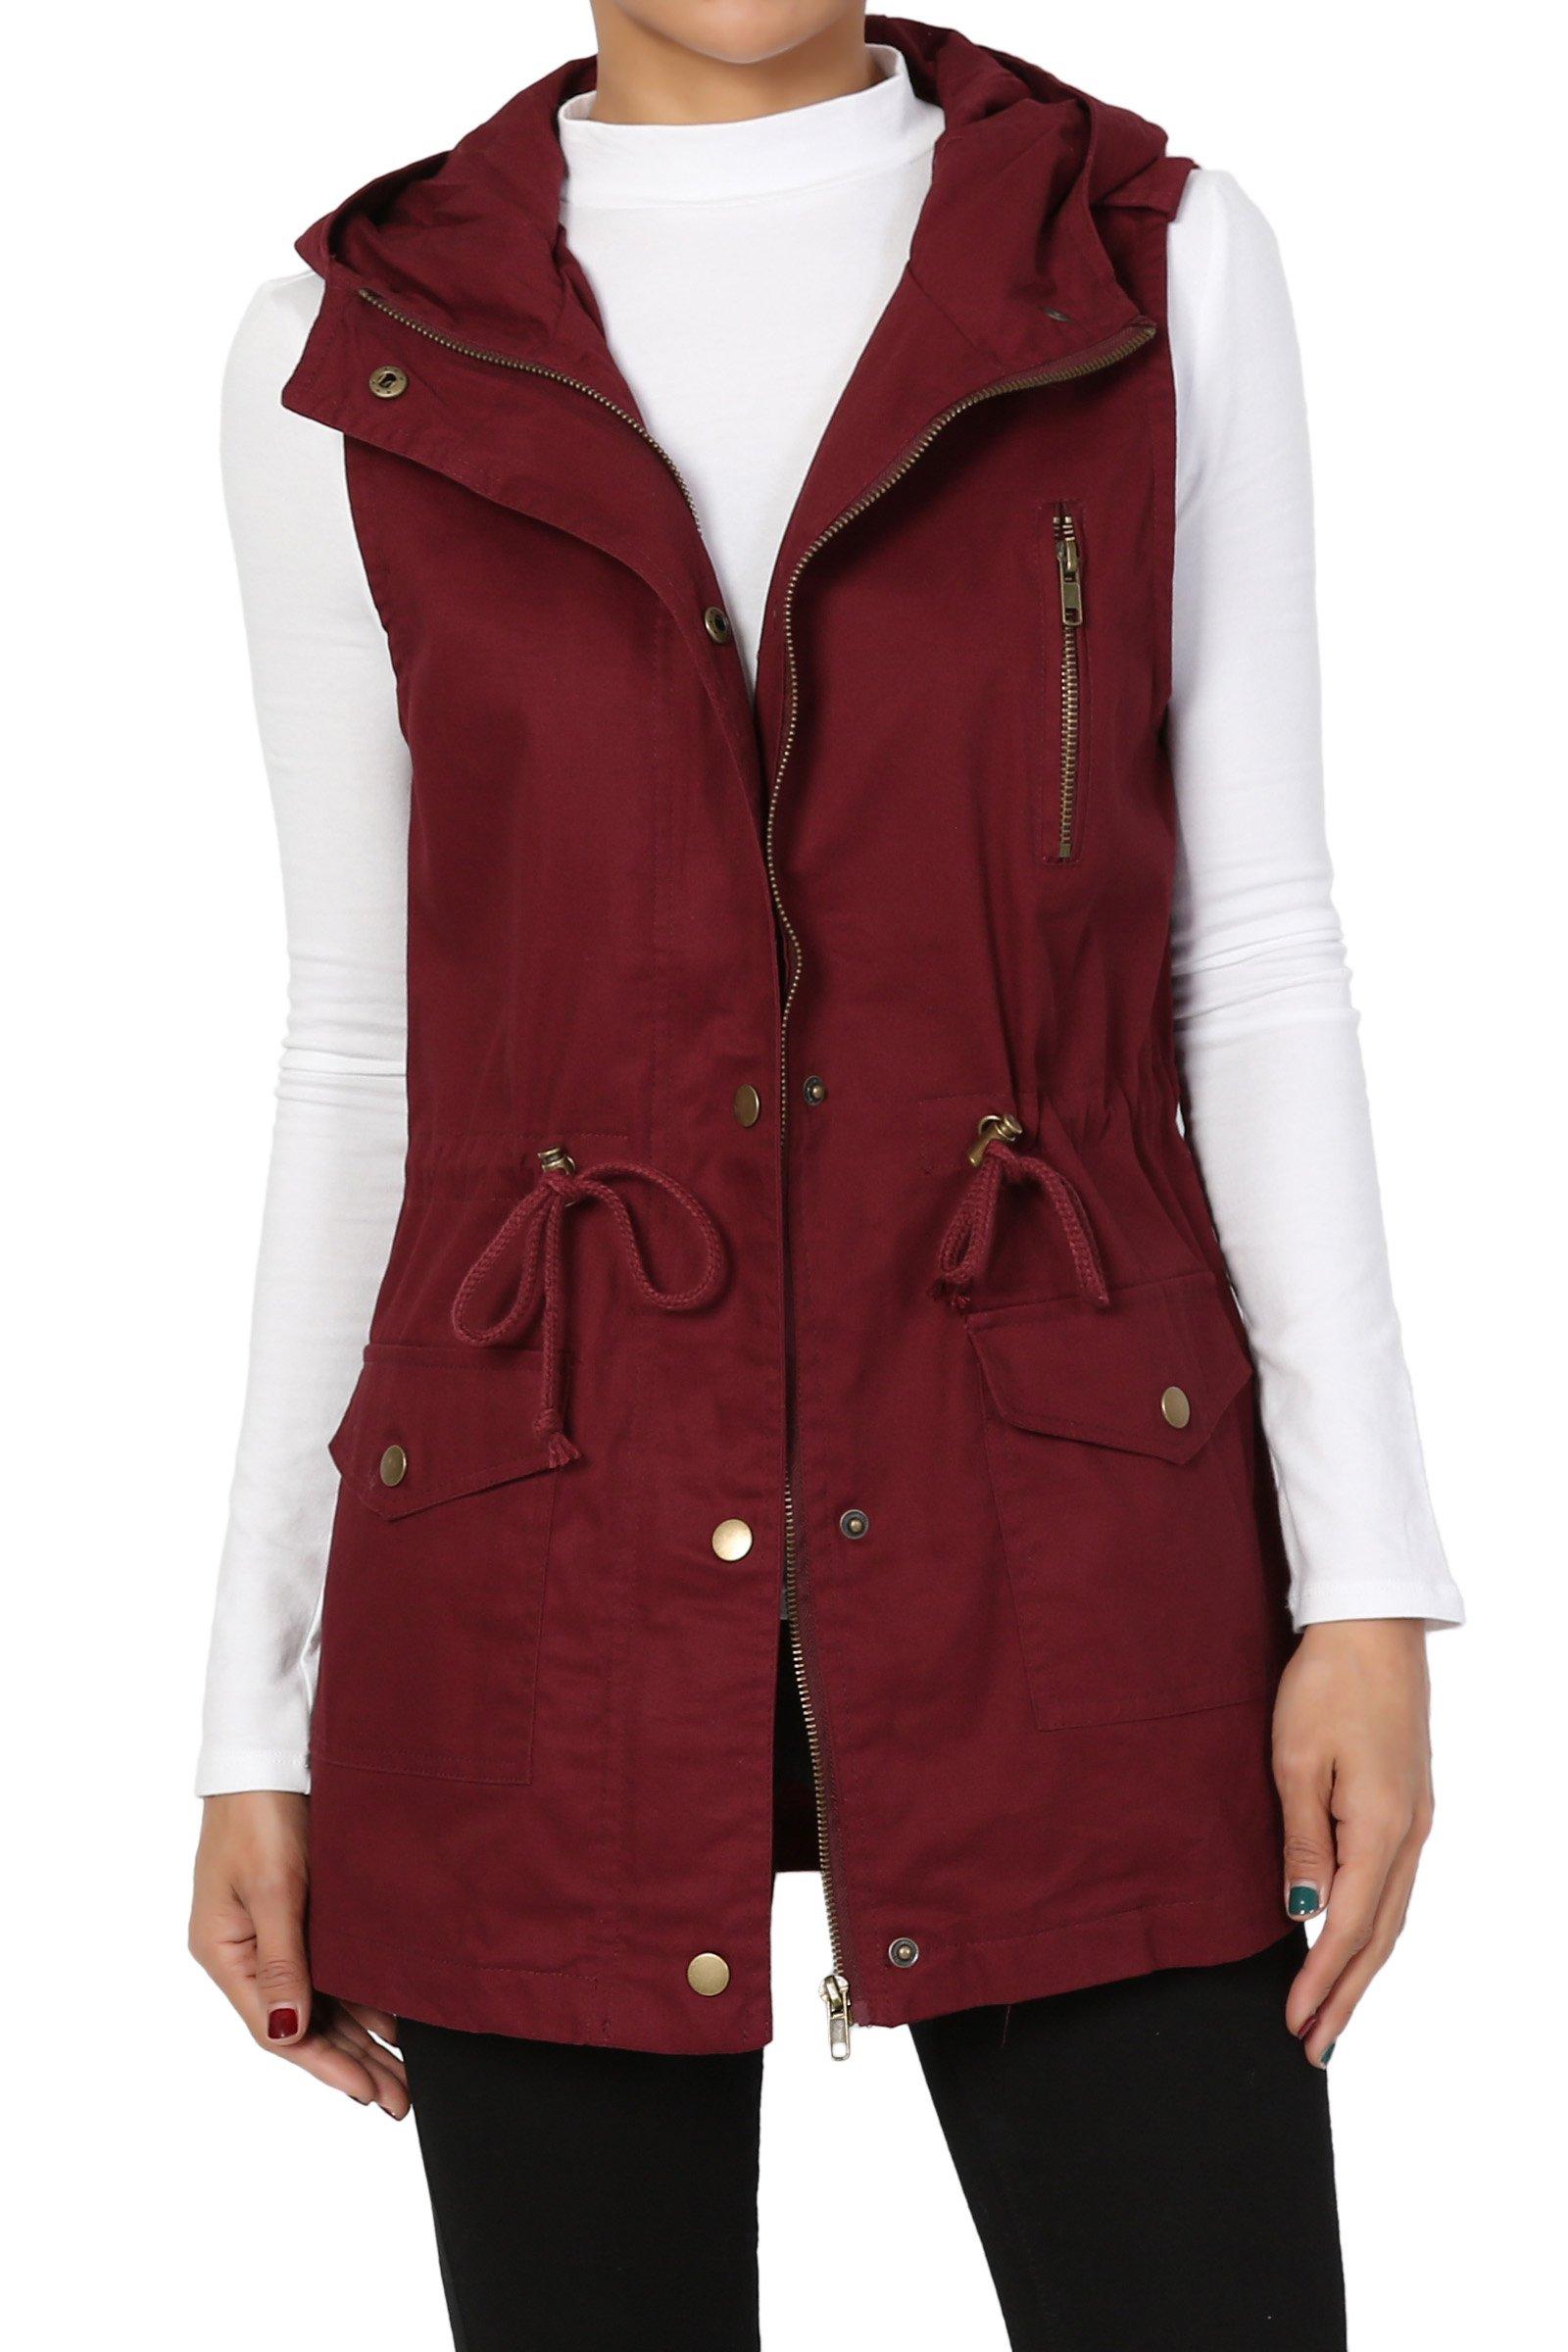 TheMogan Women's Hooded Anorak Drawstring Cotton Twill Utility Vest Dark Burgundy 1XL